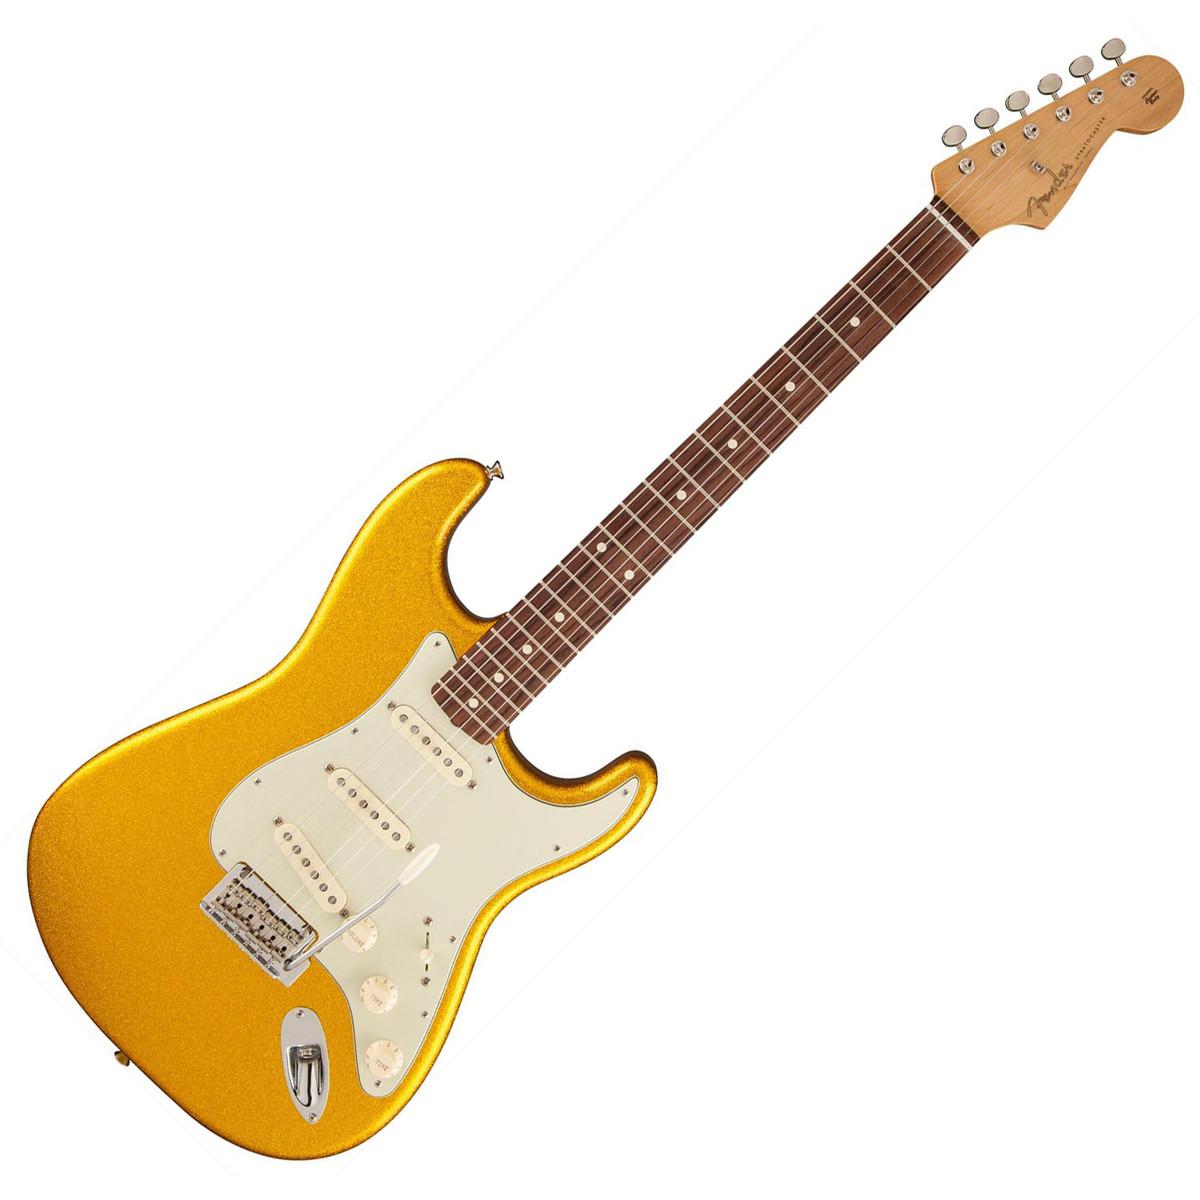 Vintage guitar player has fun 8